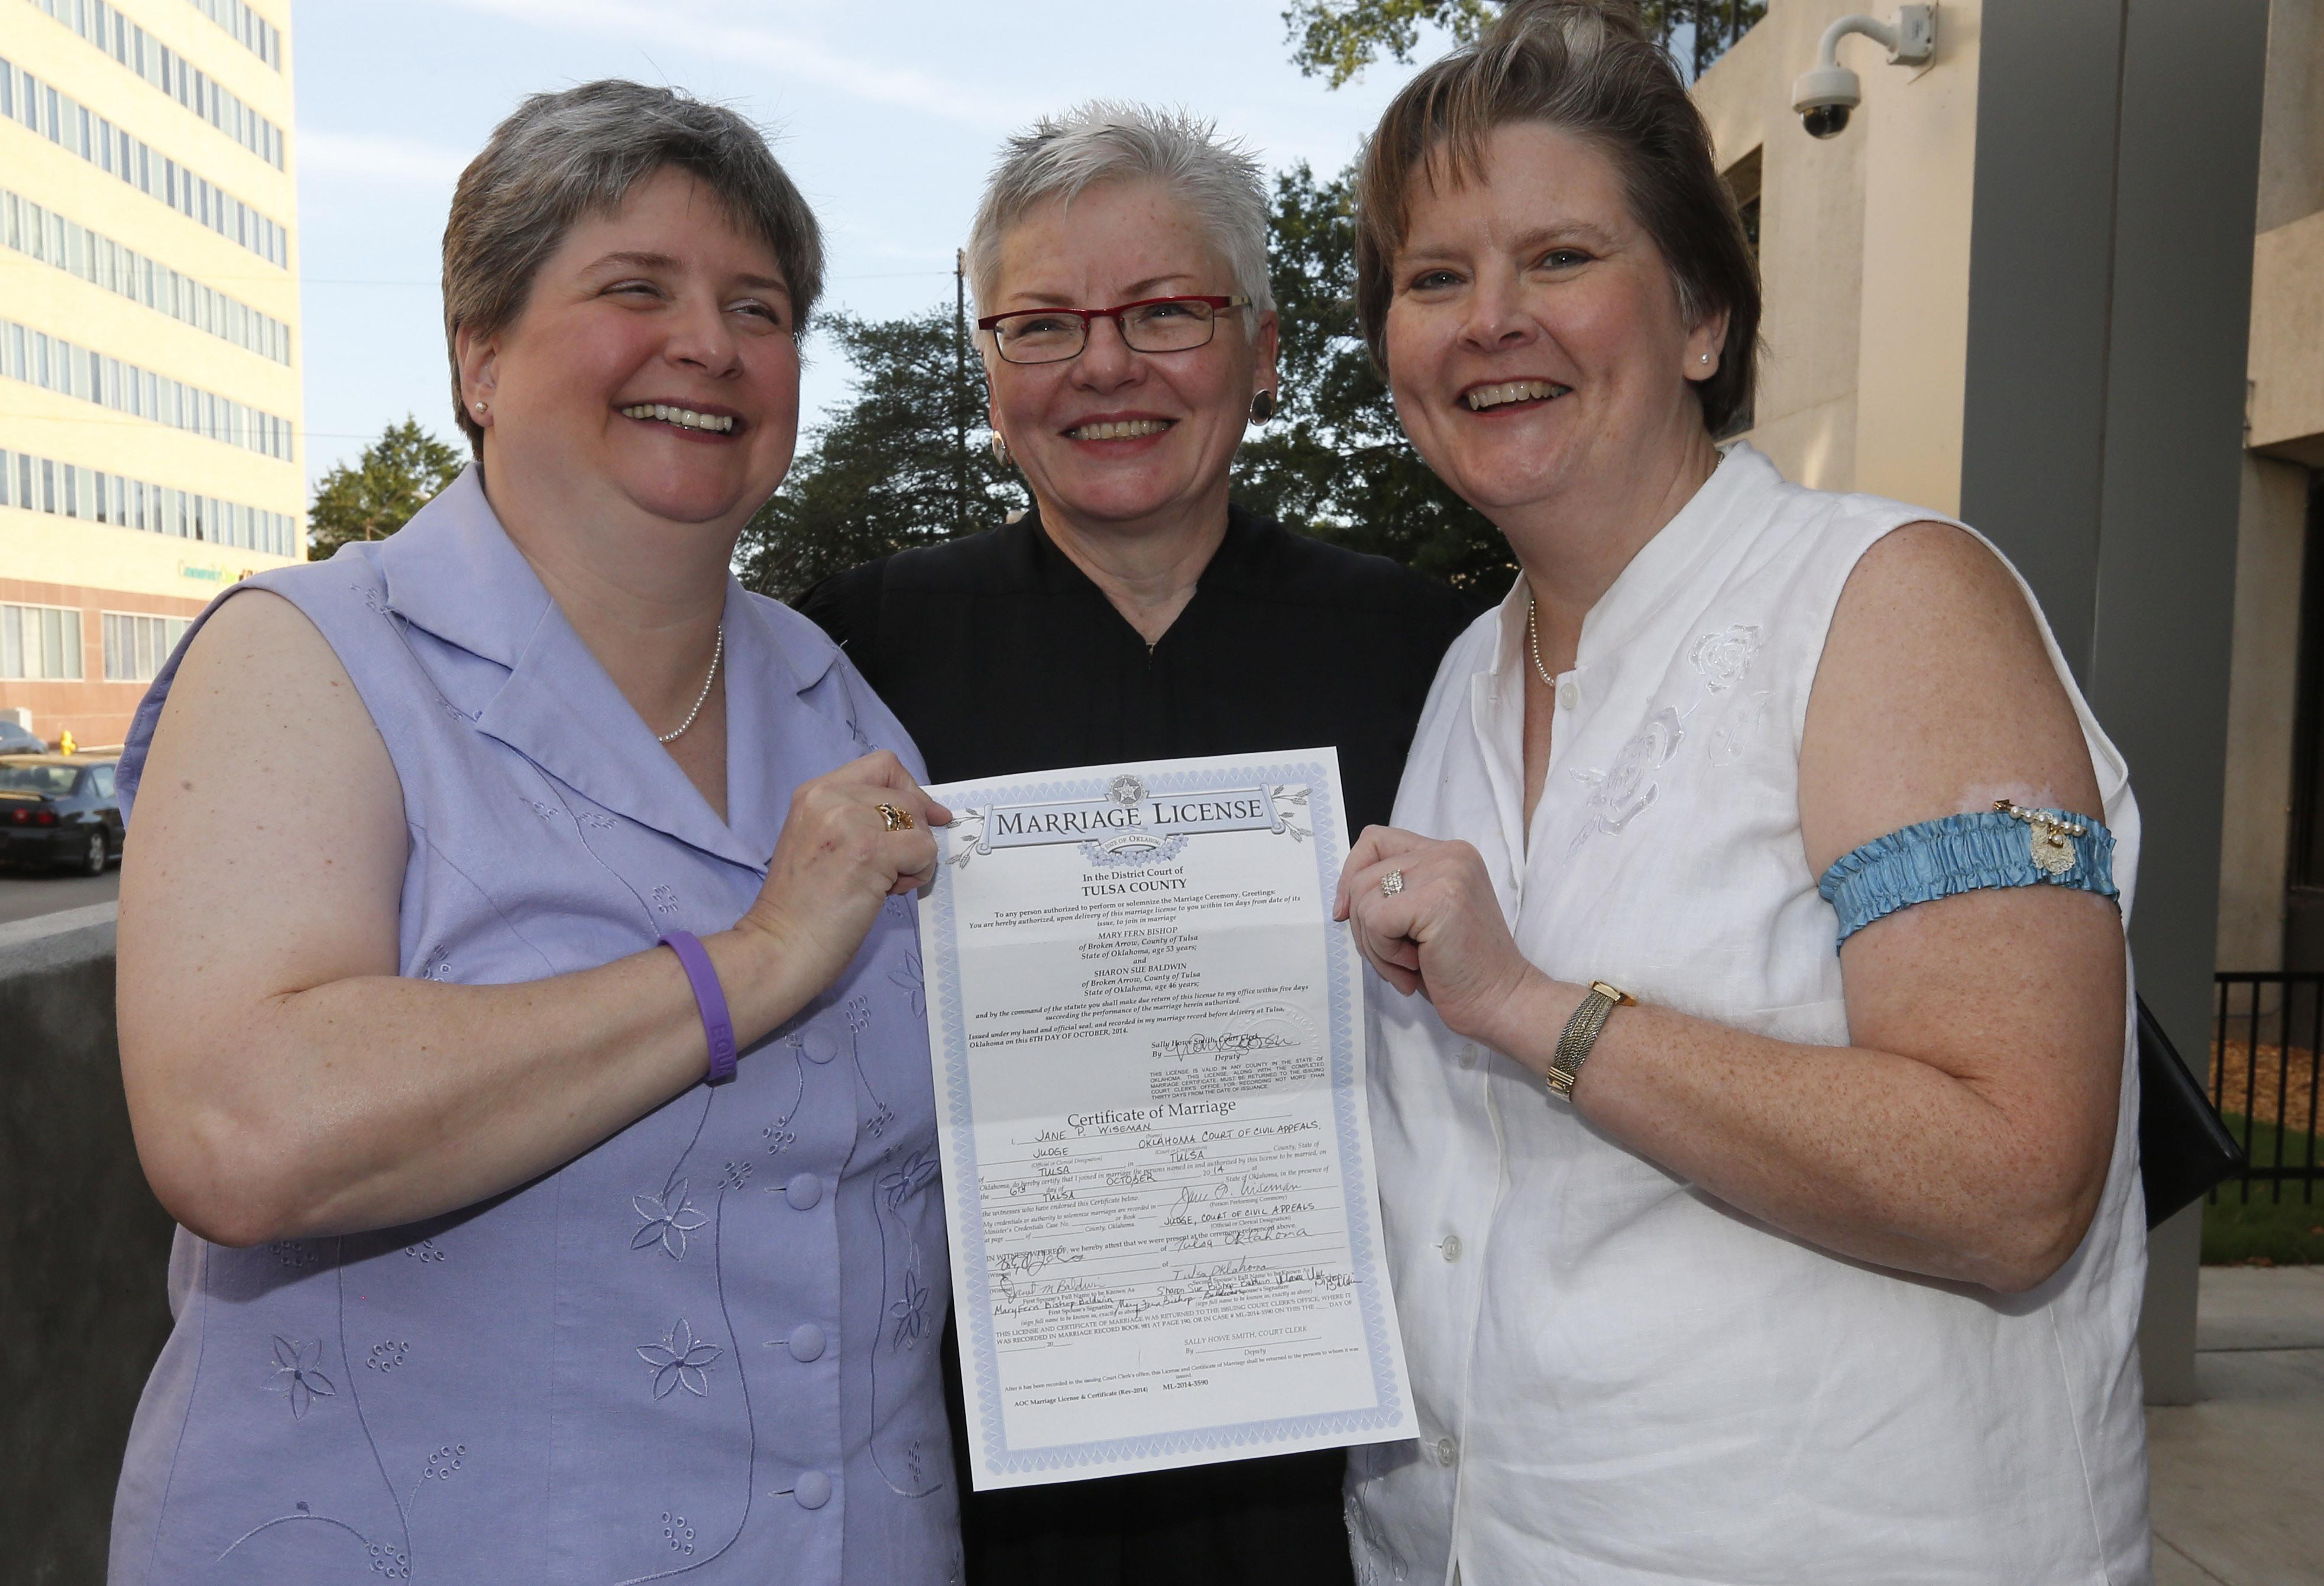 Freedom to Marry Washington State